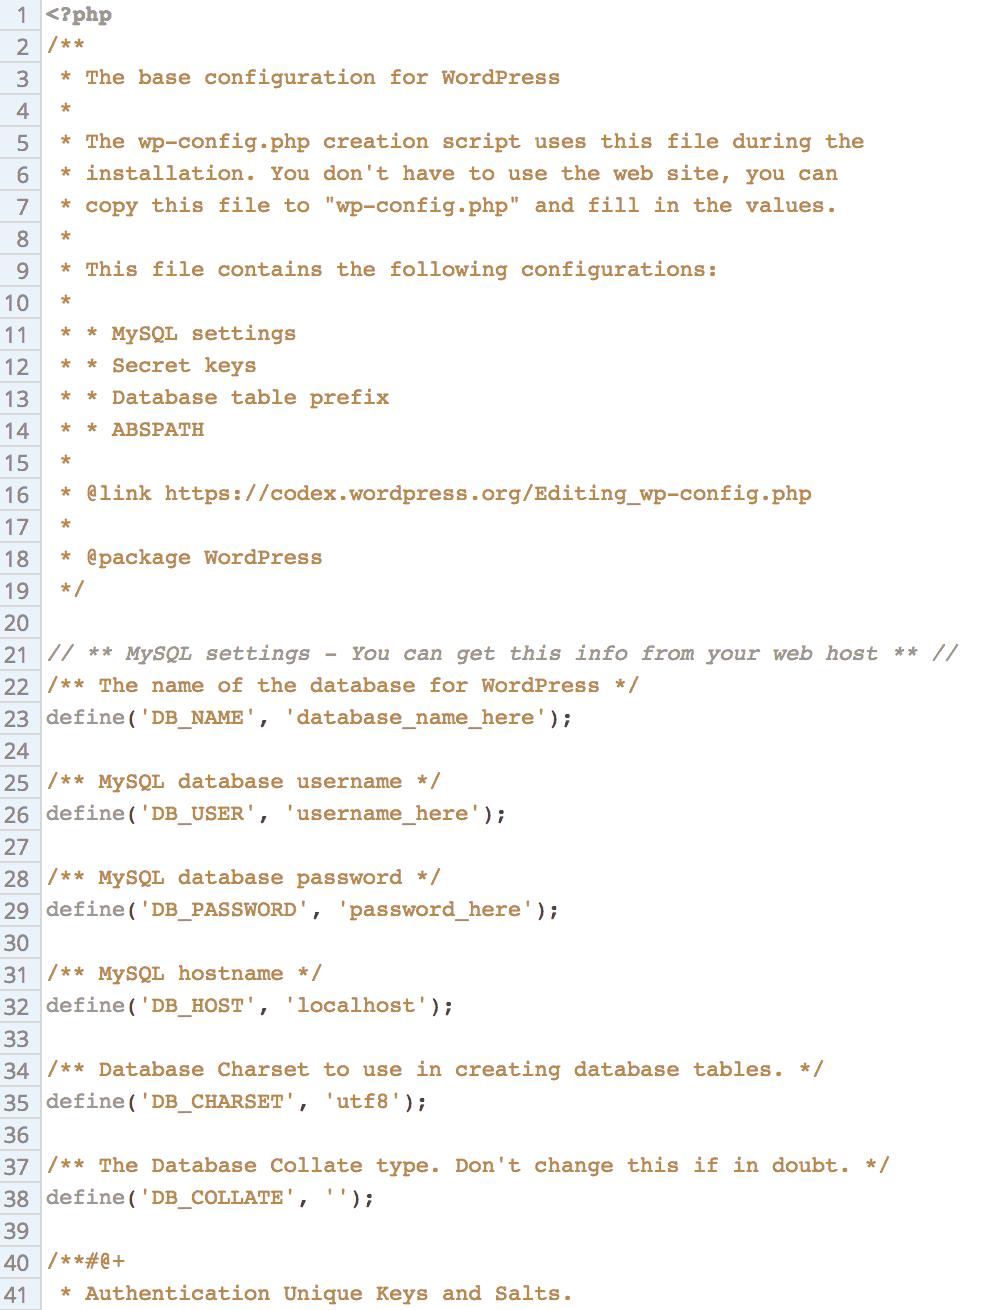 WordPress basic configuration coding in PHP. Screenshot via WhoIsHostingThis